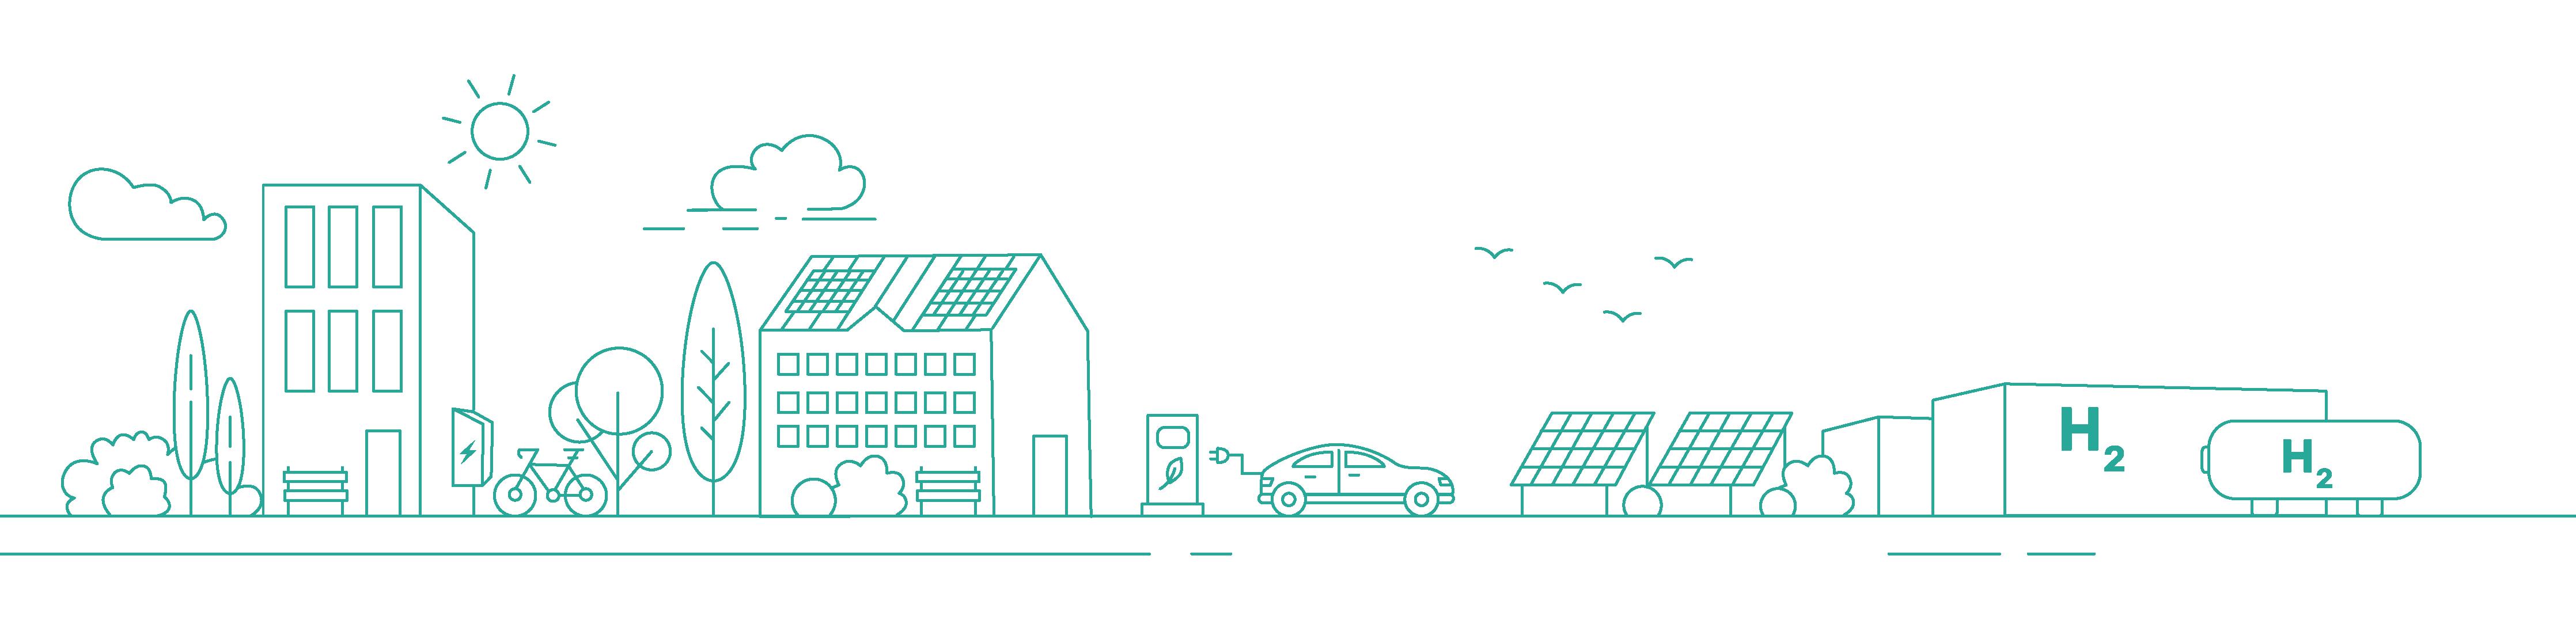 Shortcut-street_illustration_B